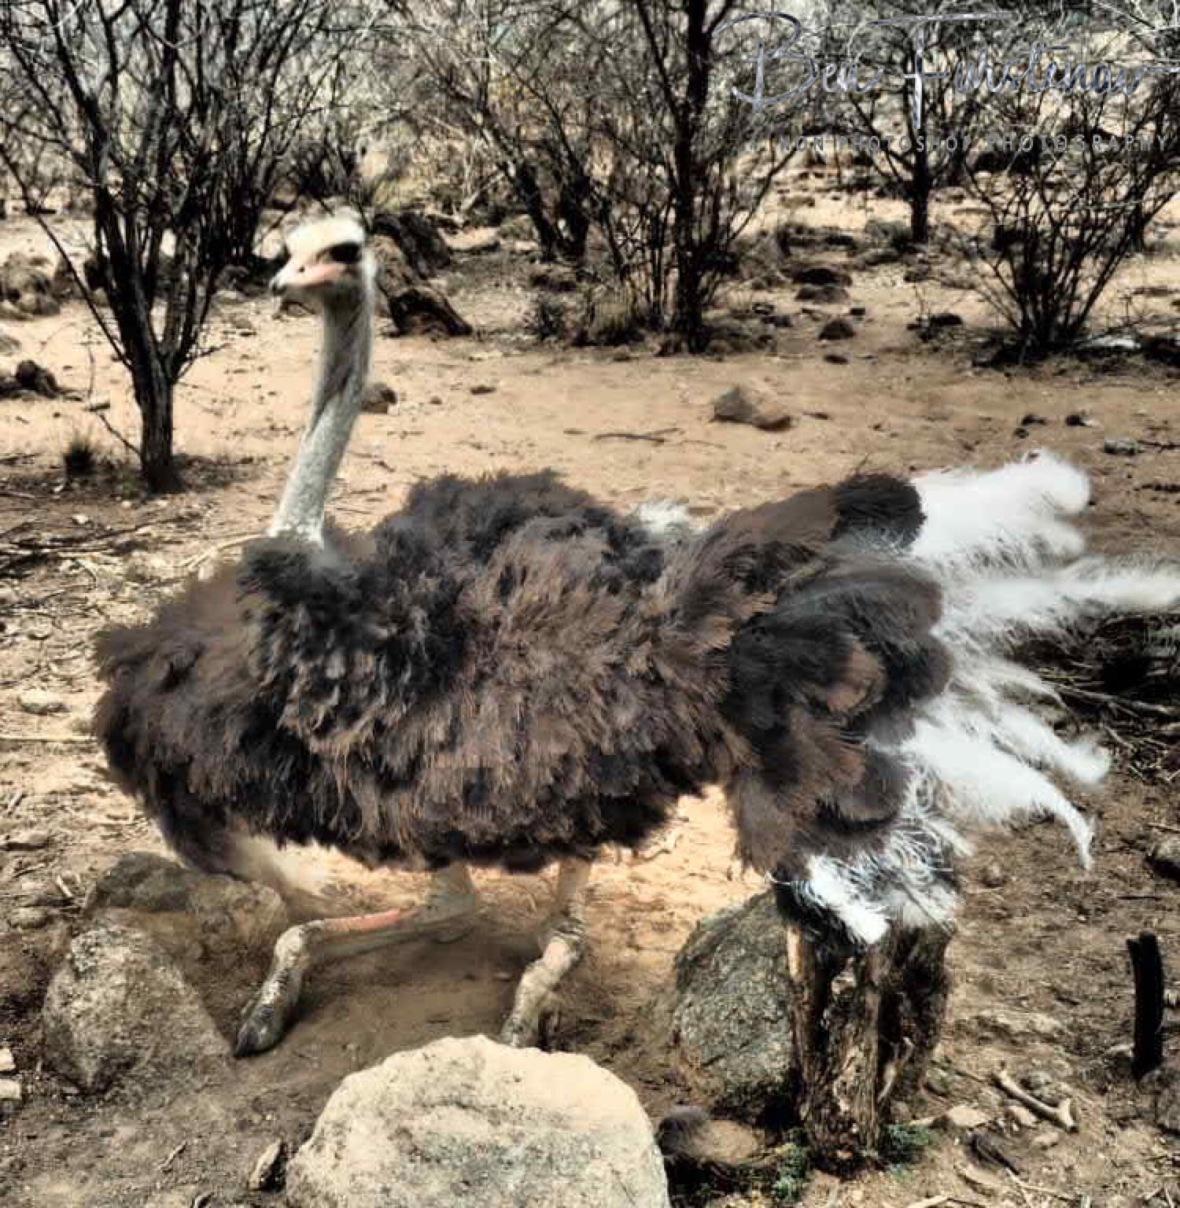 Oppi Koppi welcome dance, Kamanjab, Namibia